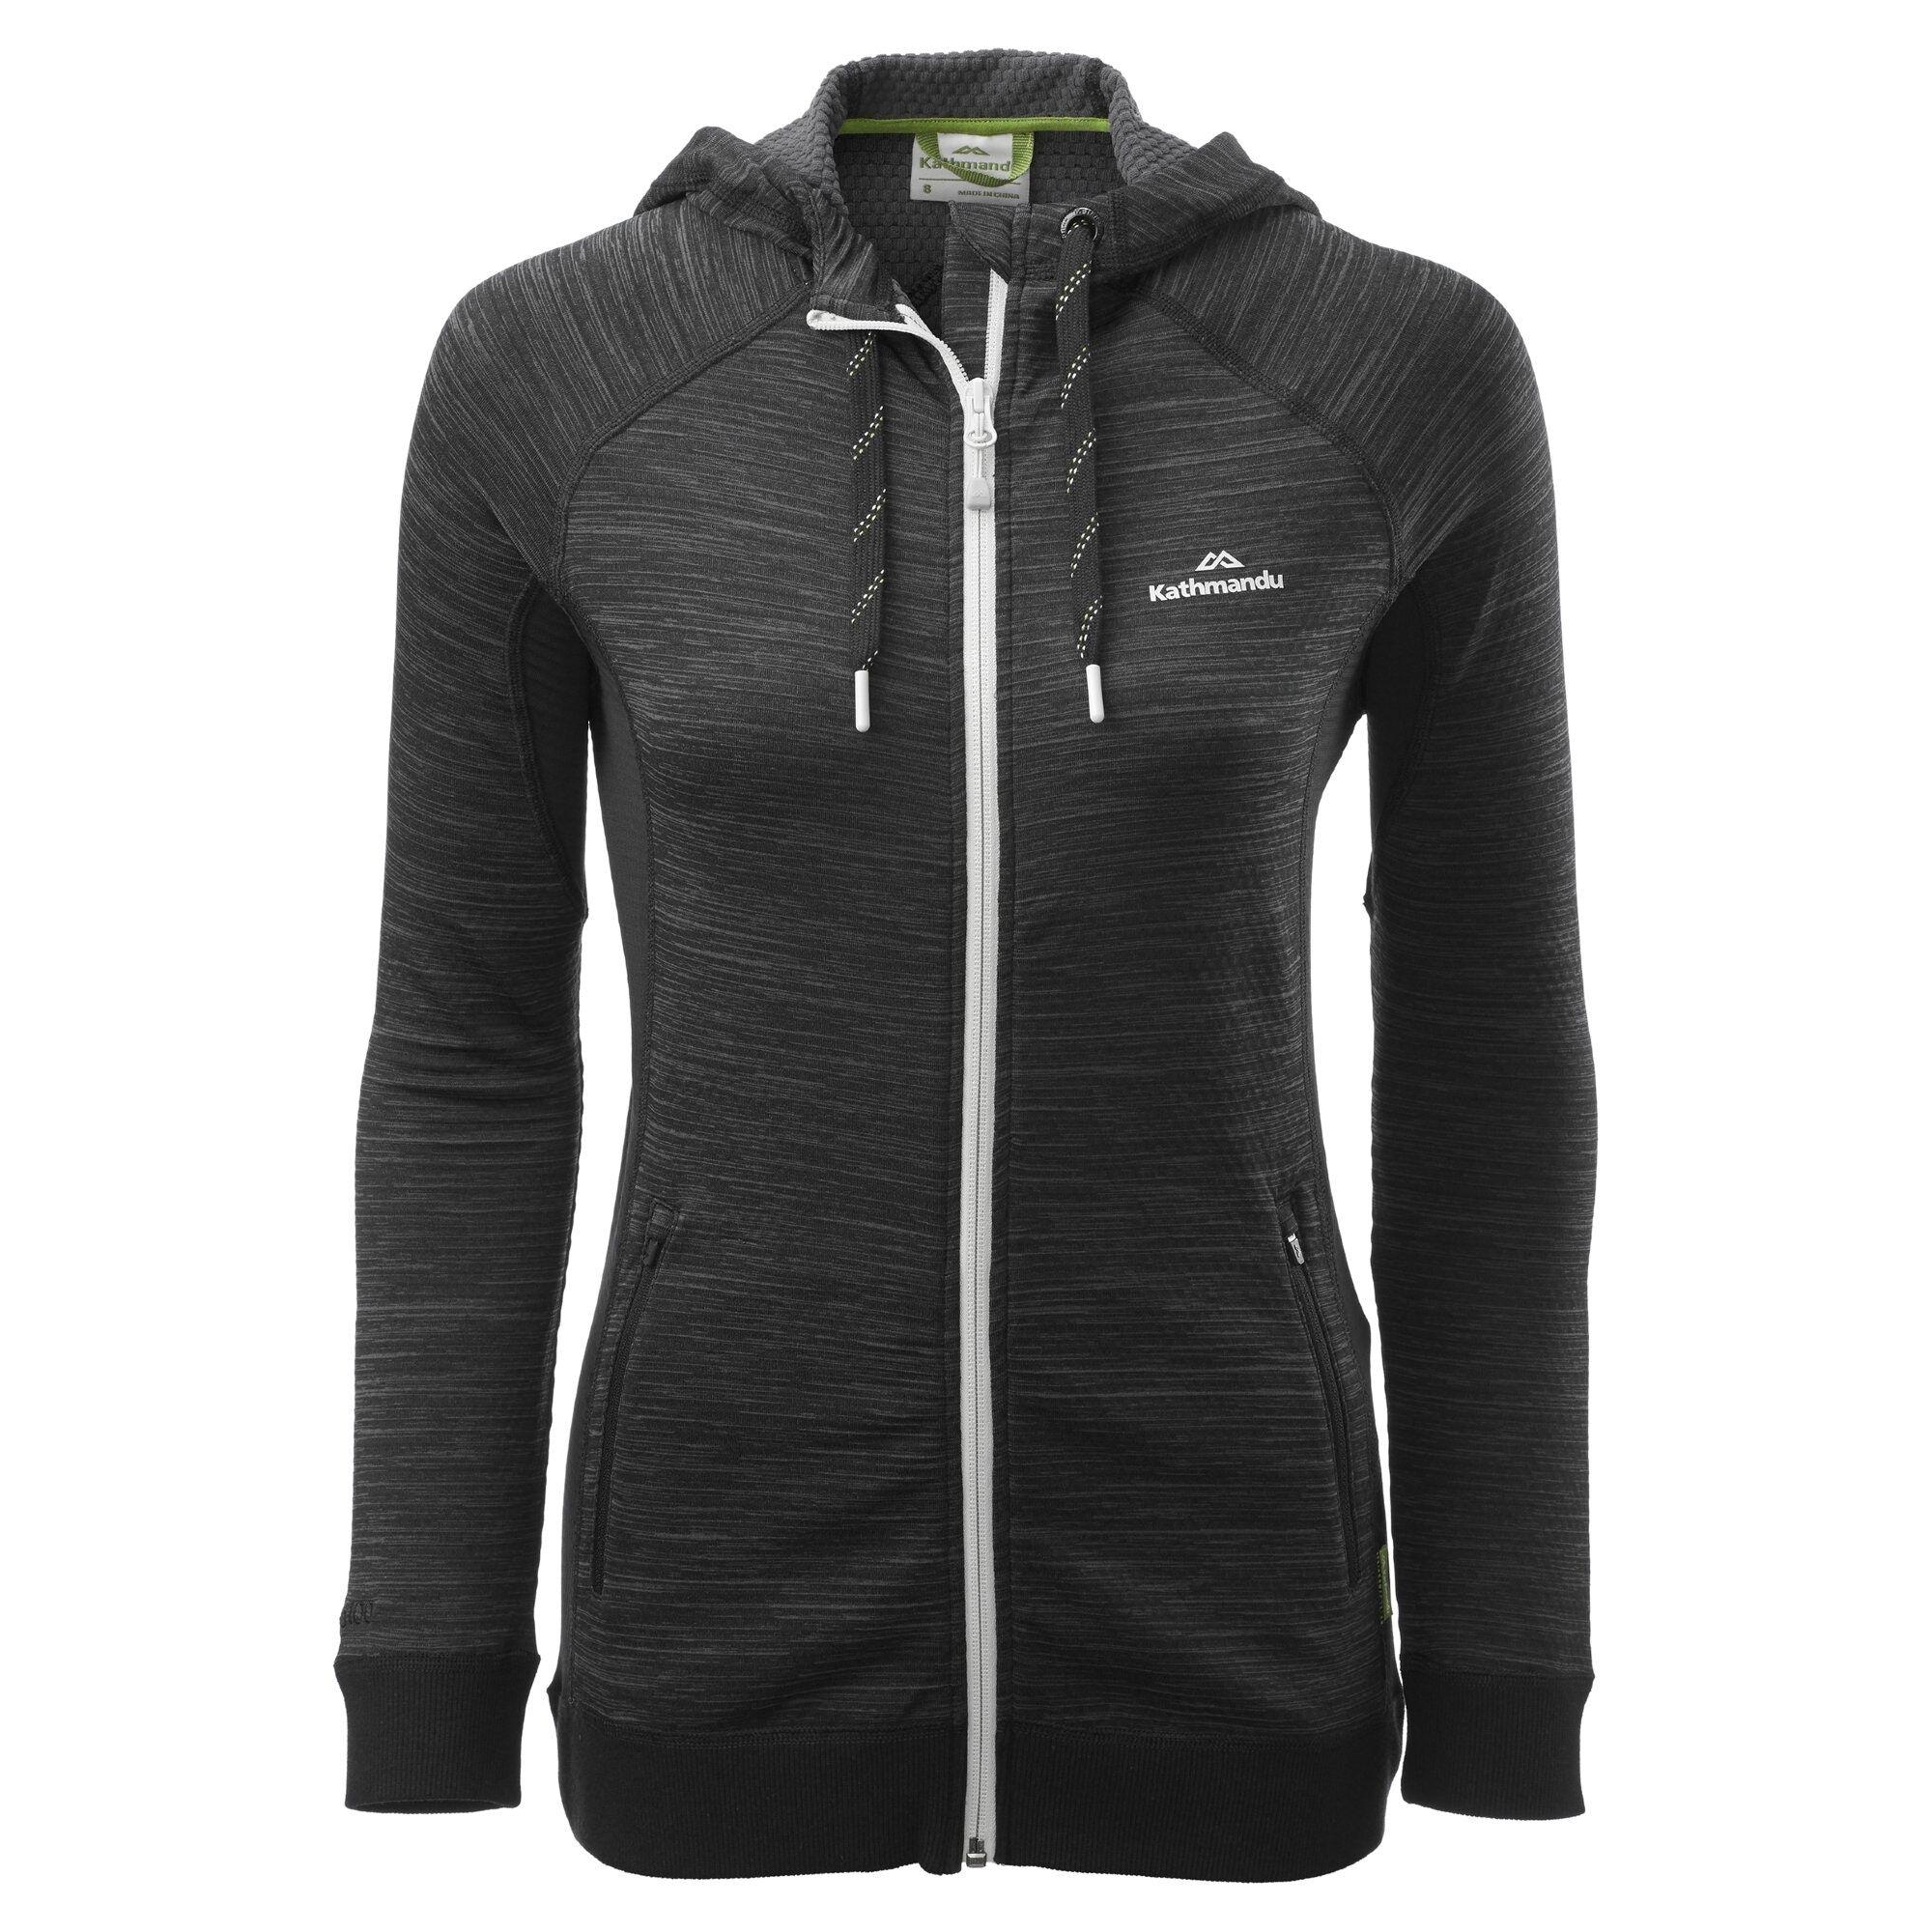 Kathmandu Acota Women's Hooded Fleece Jacket  - Granite Marle/Black - Size: US 10